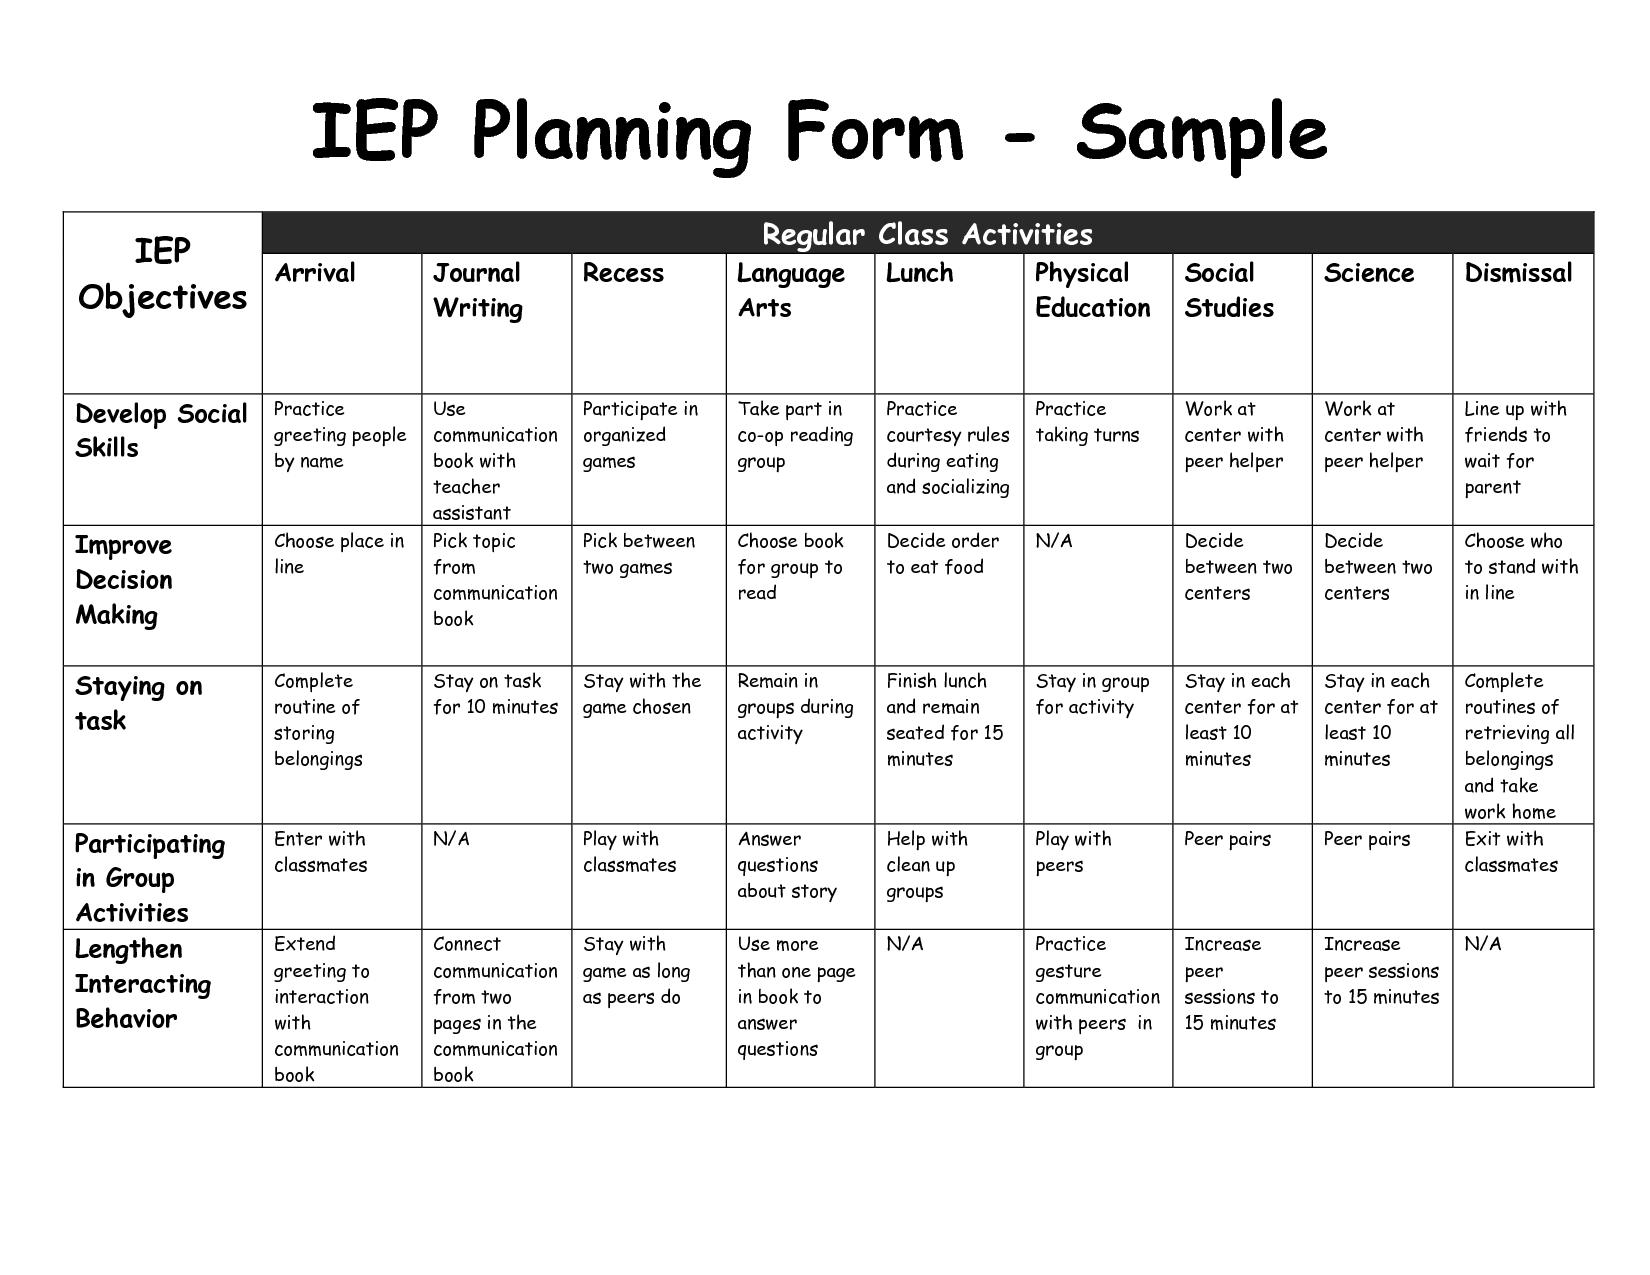 Iep Planning Form Sample